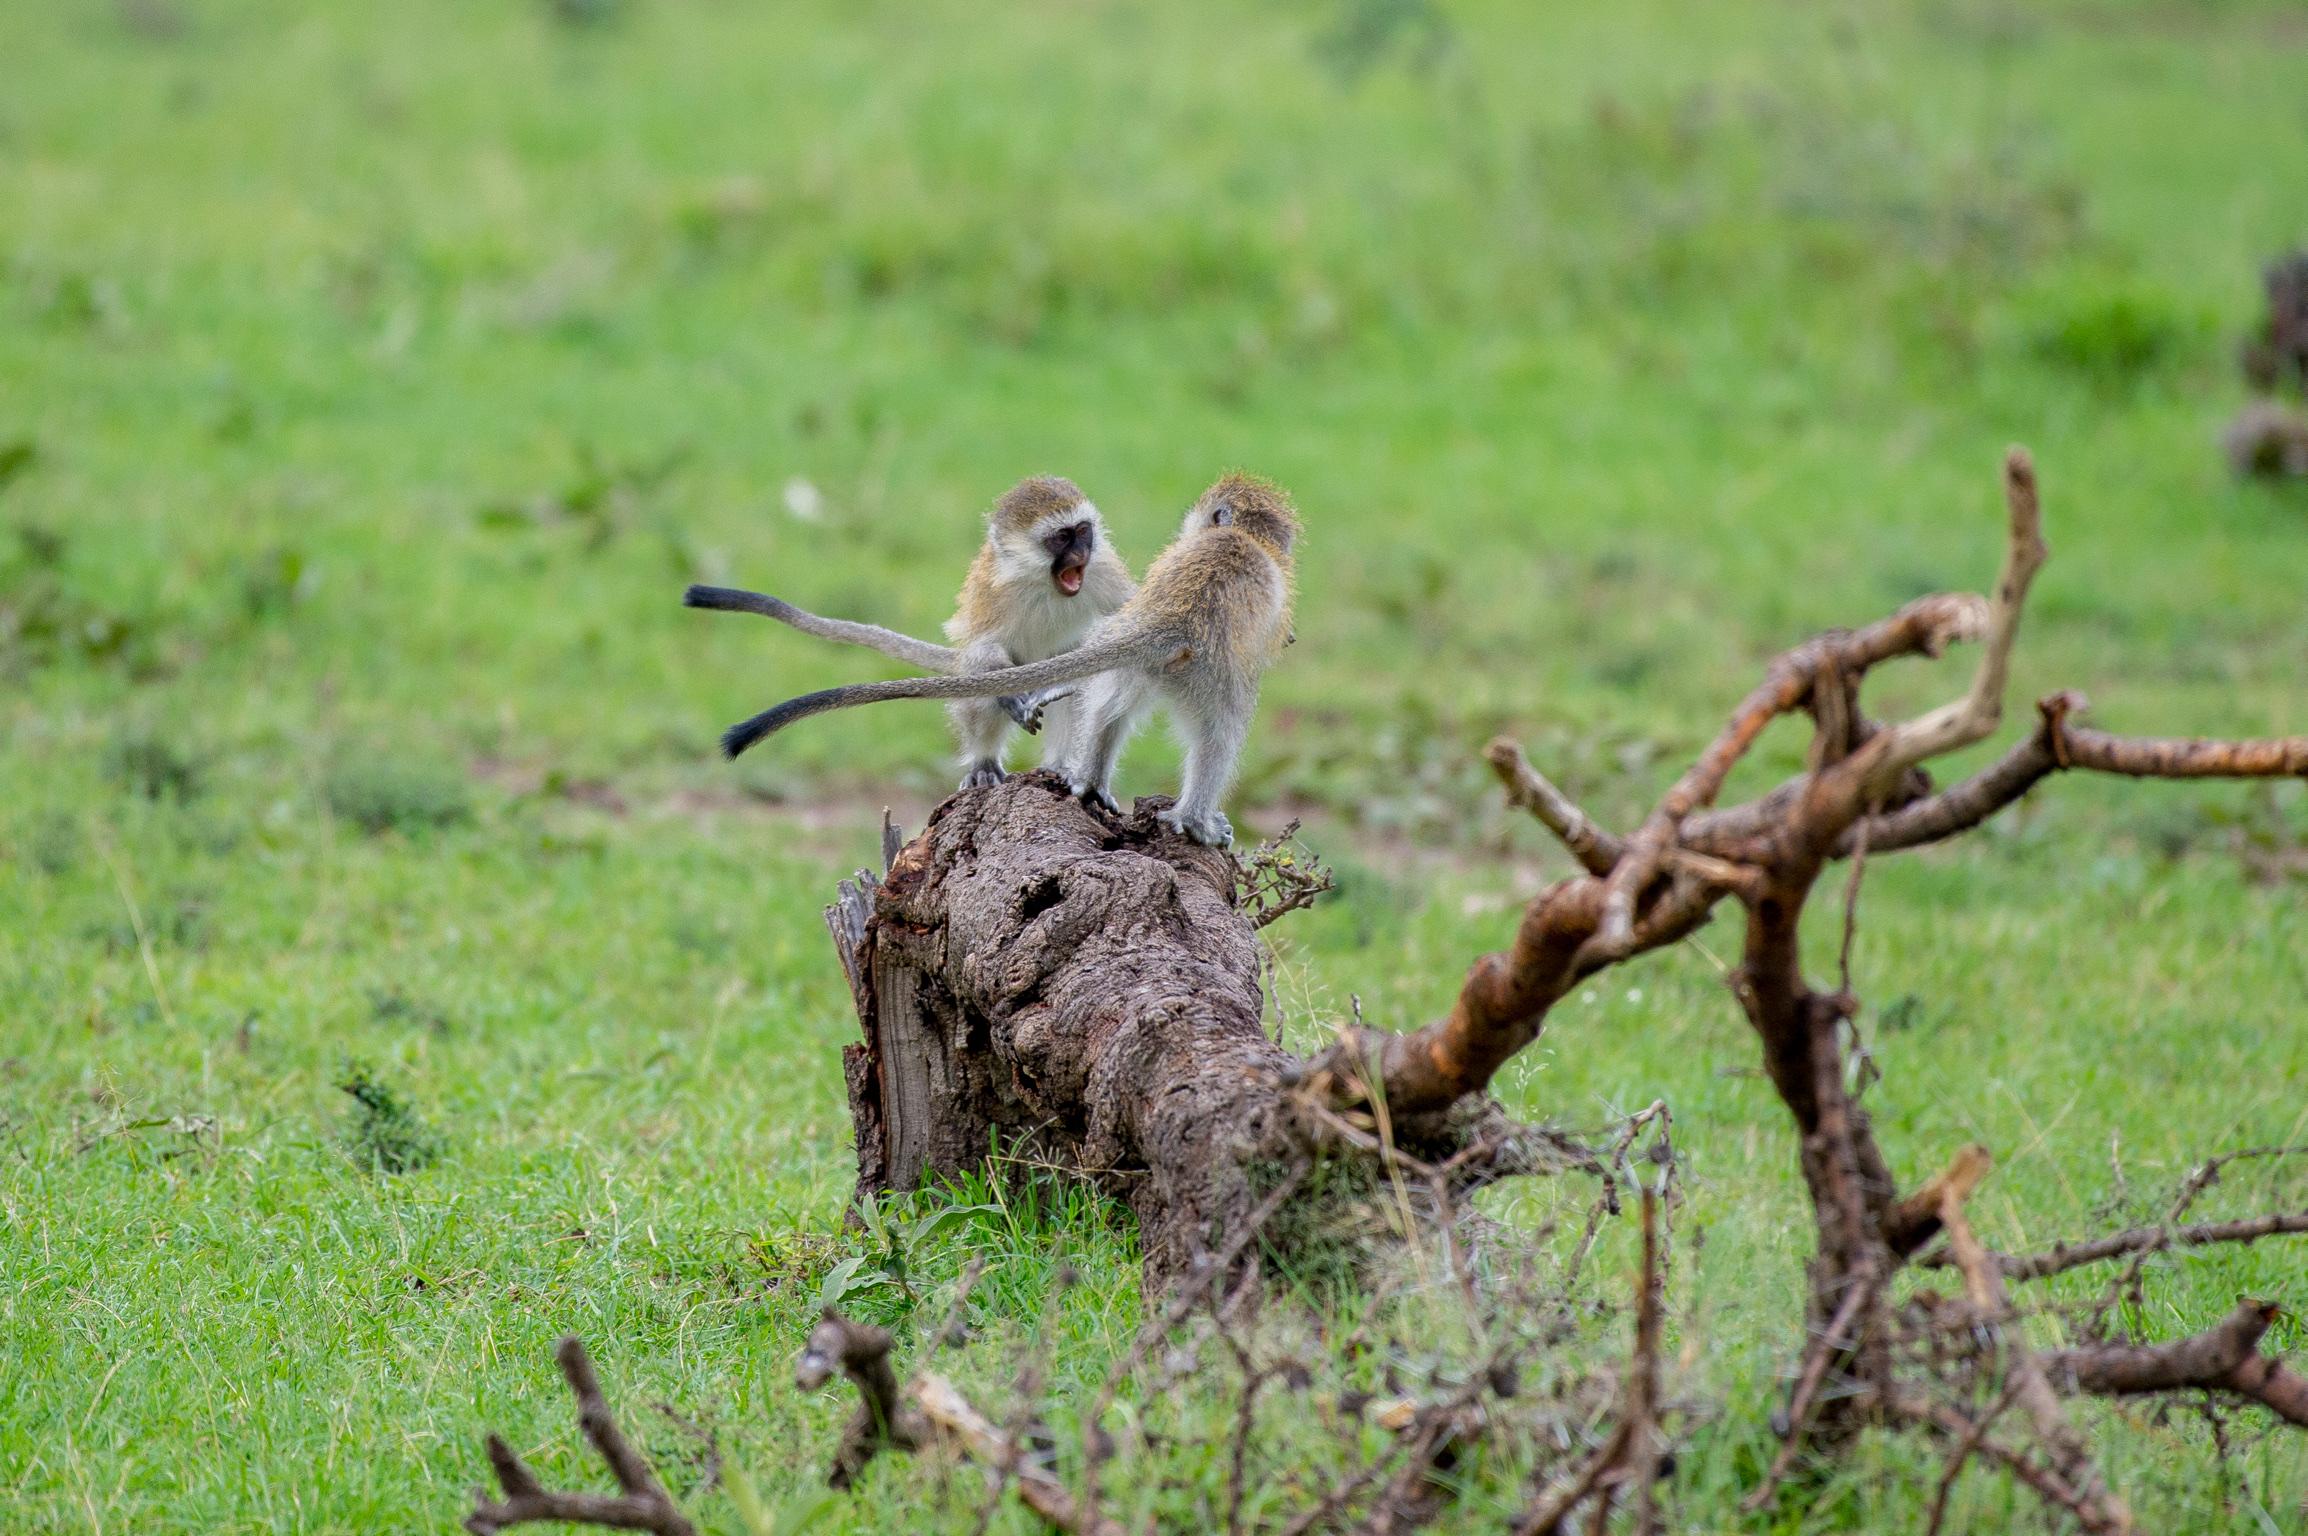 Kenya 2018 - Safari Day 3-67.jpg